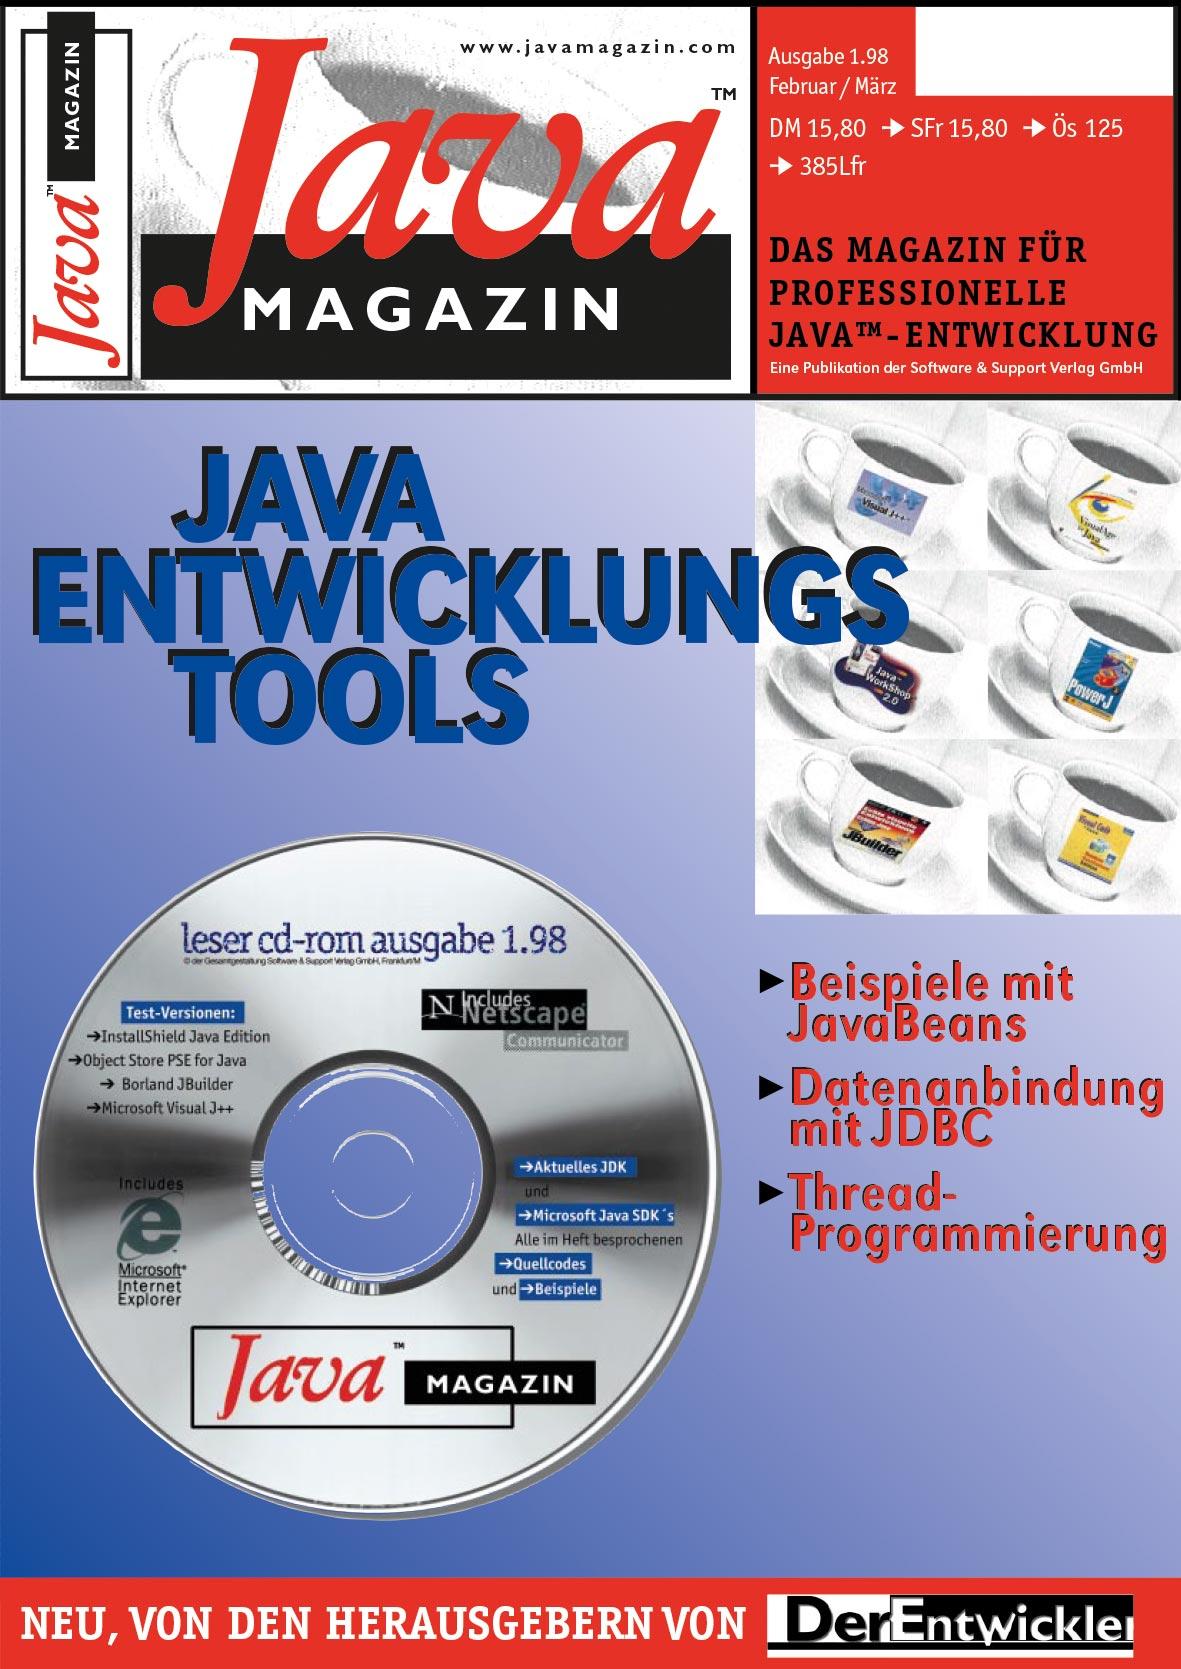 JM1_1998.tif_fmt1.jpg